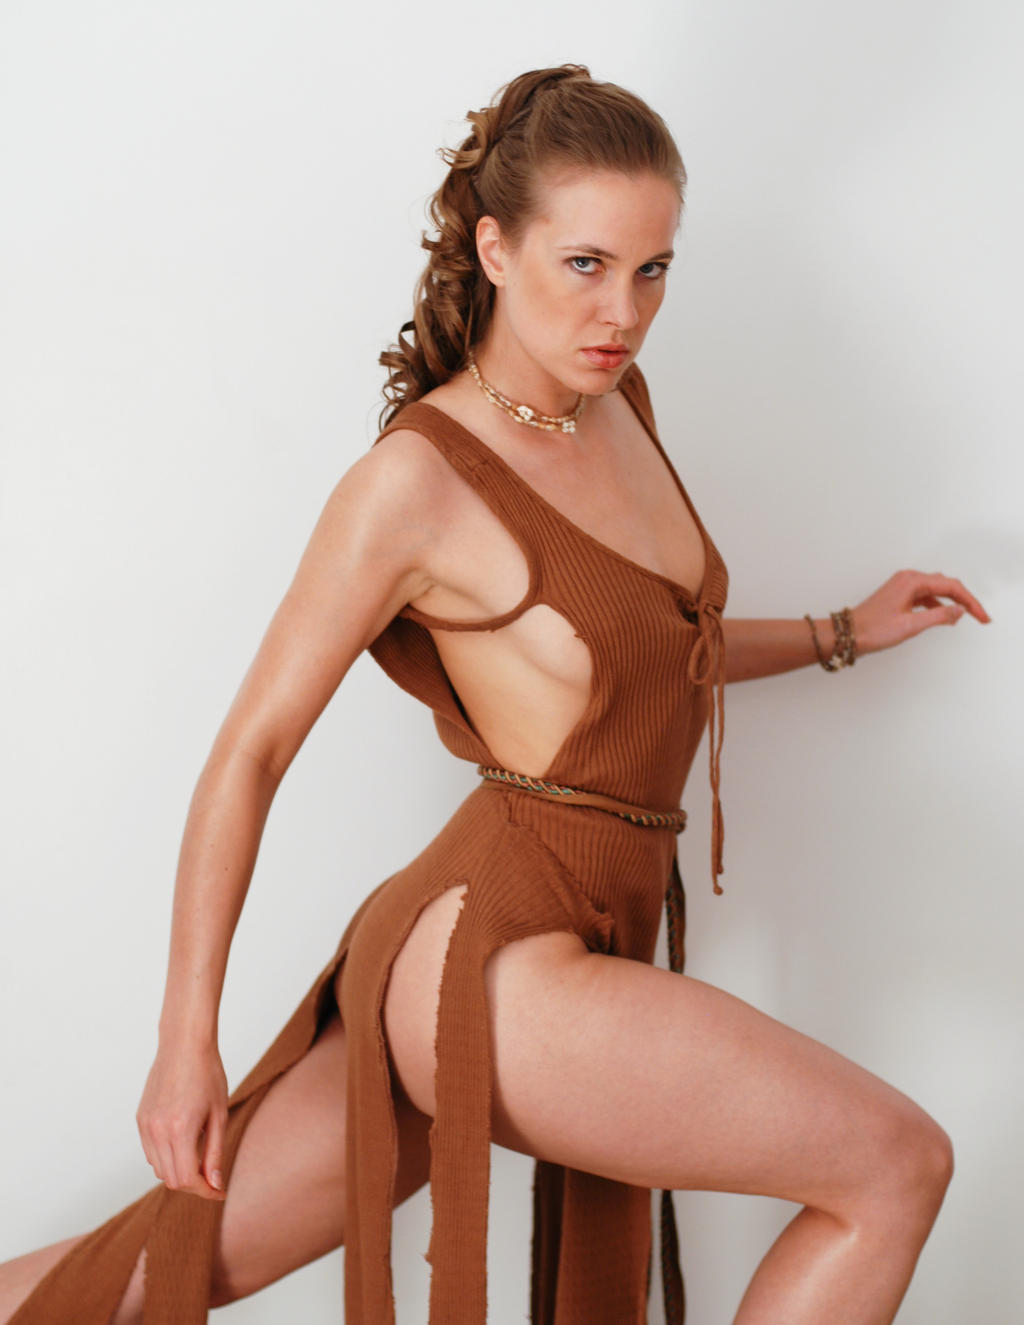 Angela Tribal 6a